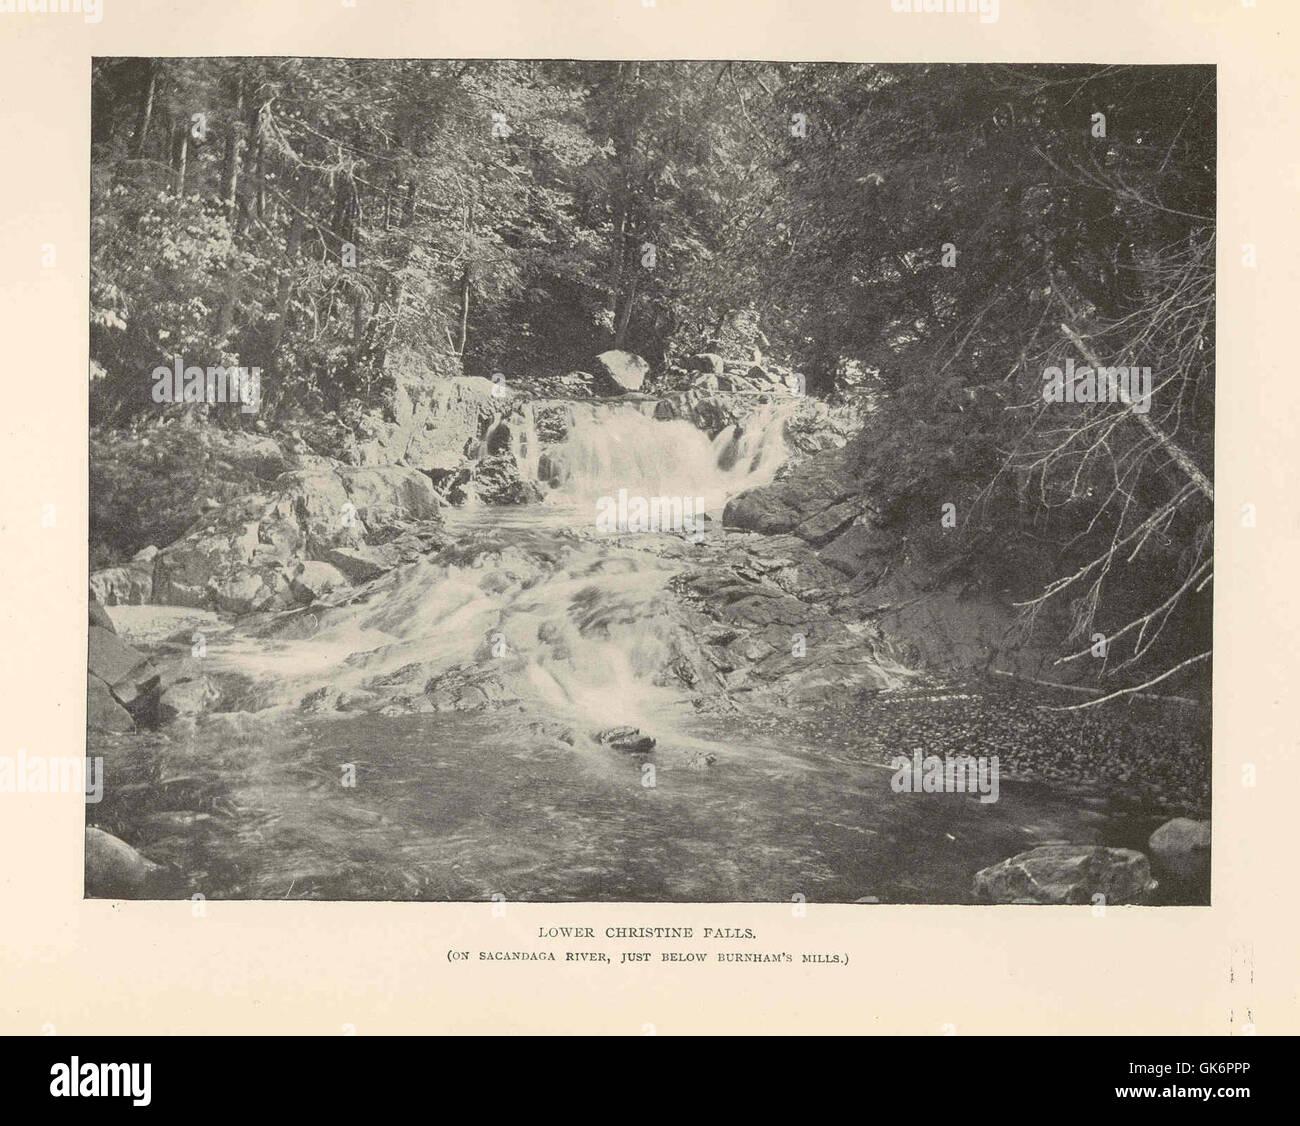 41649 Lower Christine Falls (On Sacandaga River, just below Burnham's Mills) - Stock Image